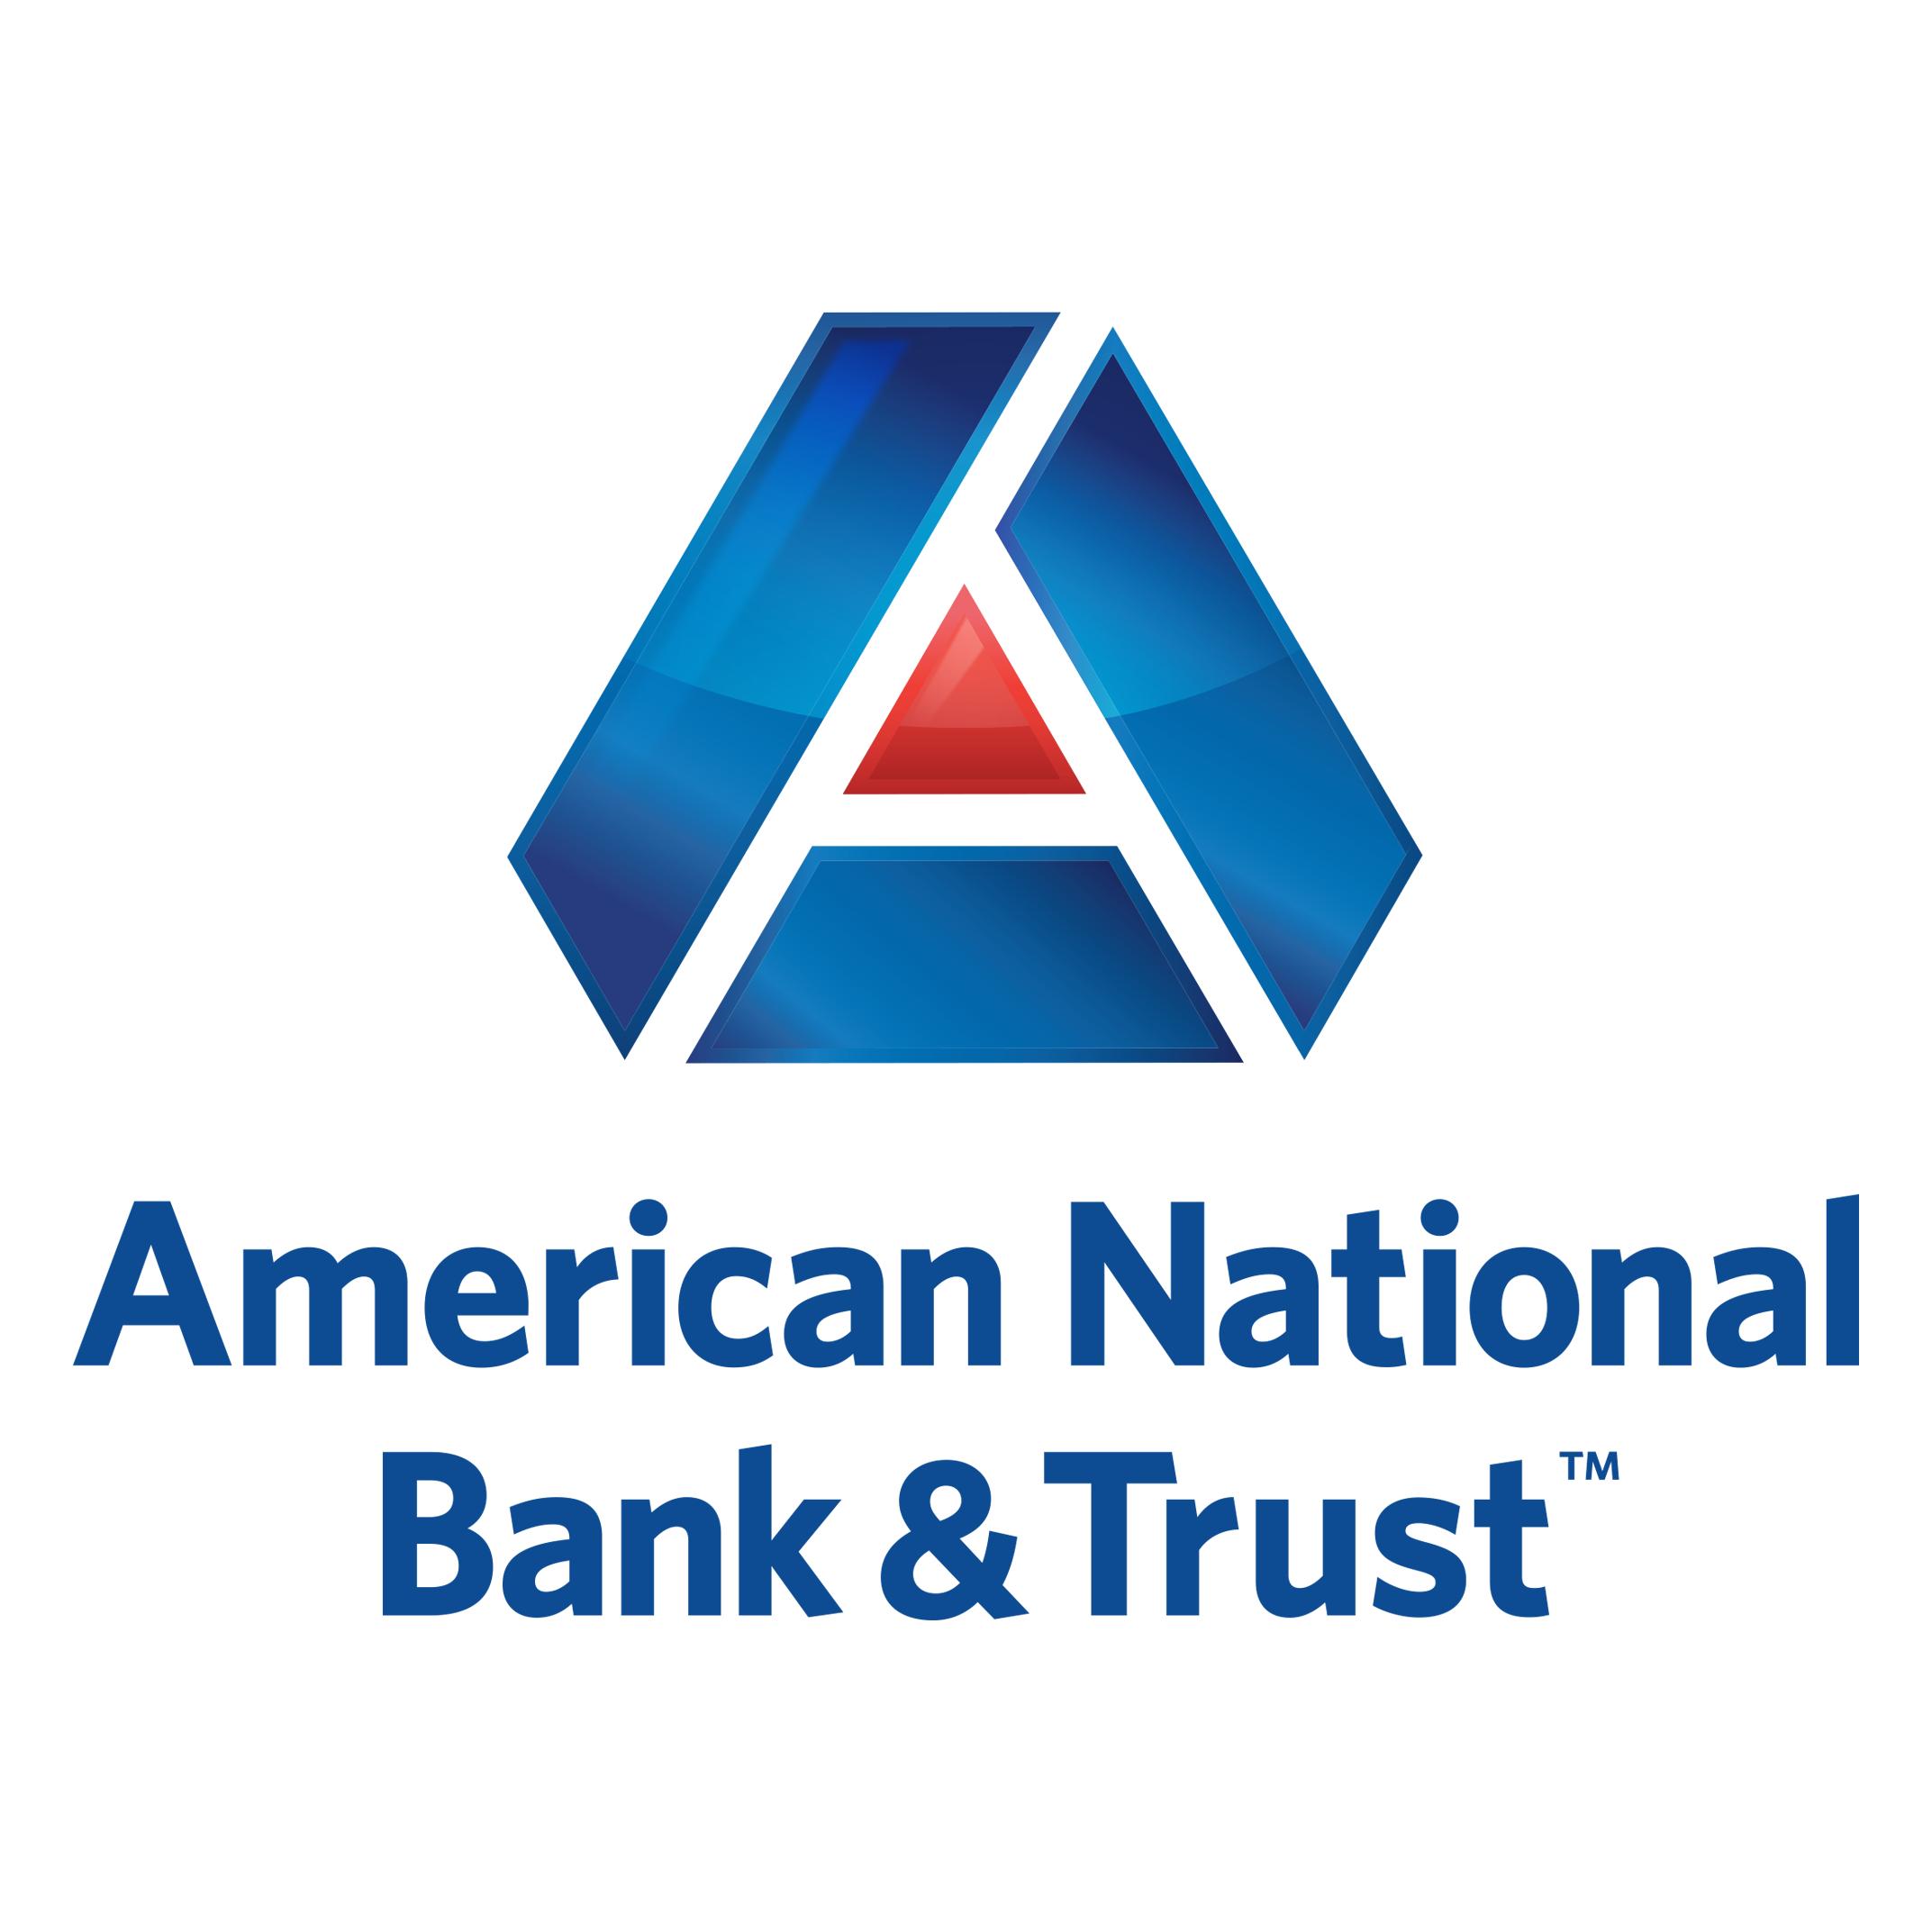 American National Bank & Trust image 1